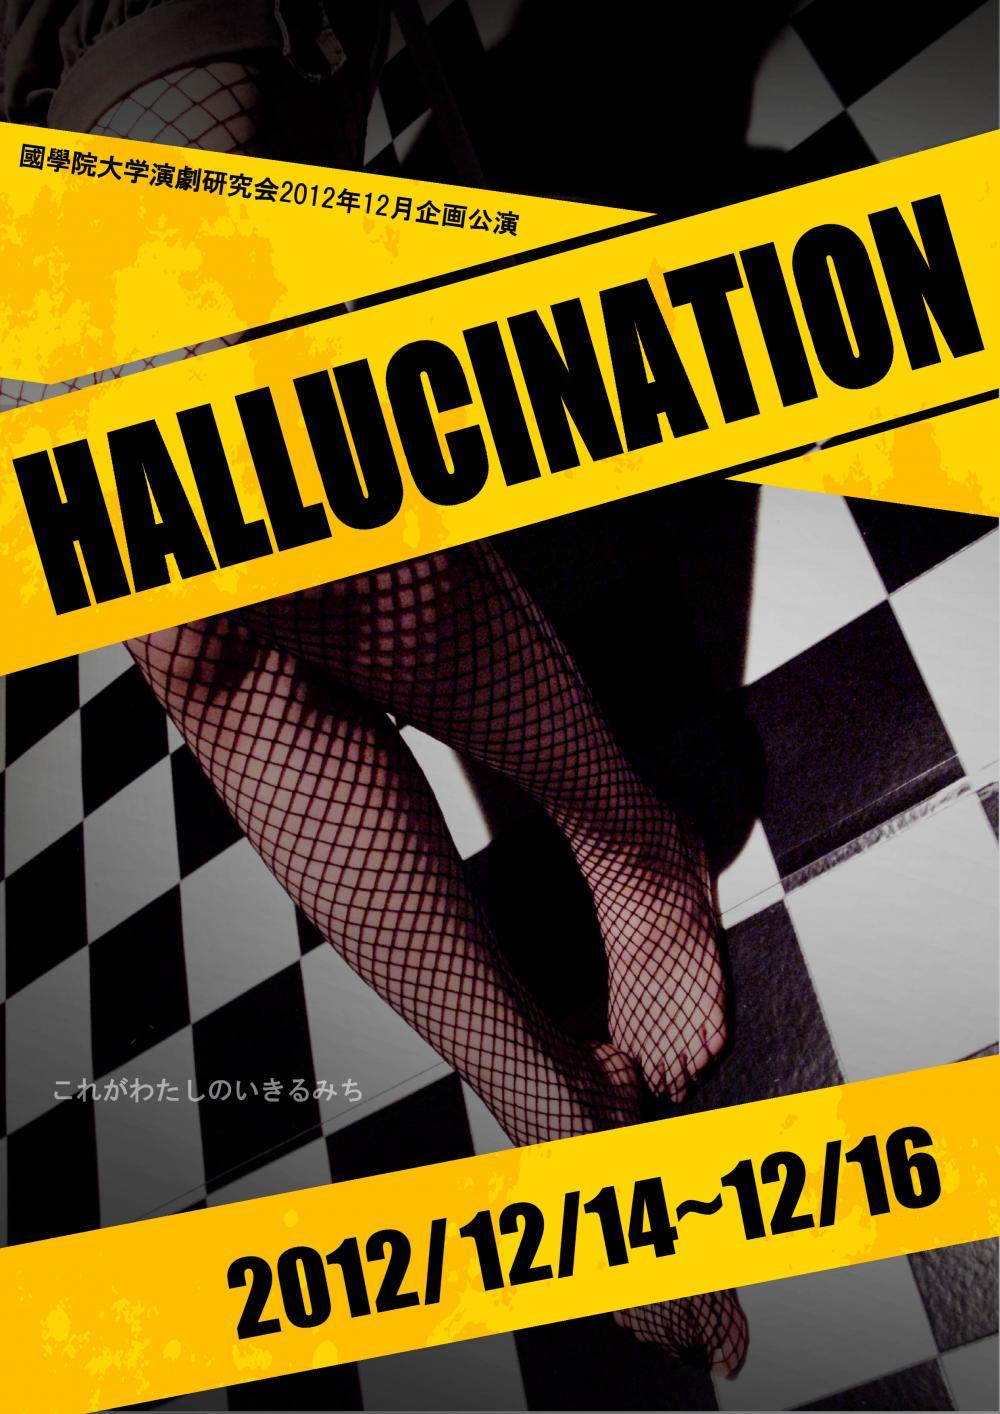 Hallcination表3改-1_convert_20130324232715